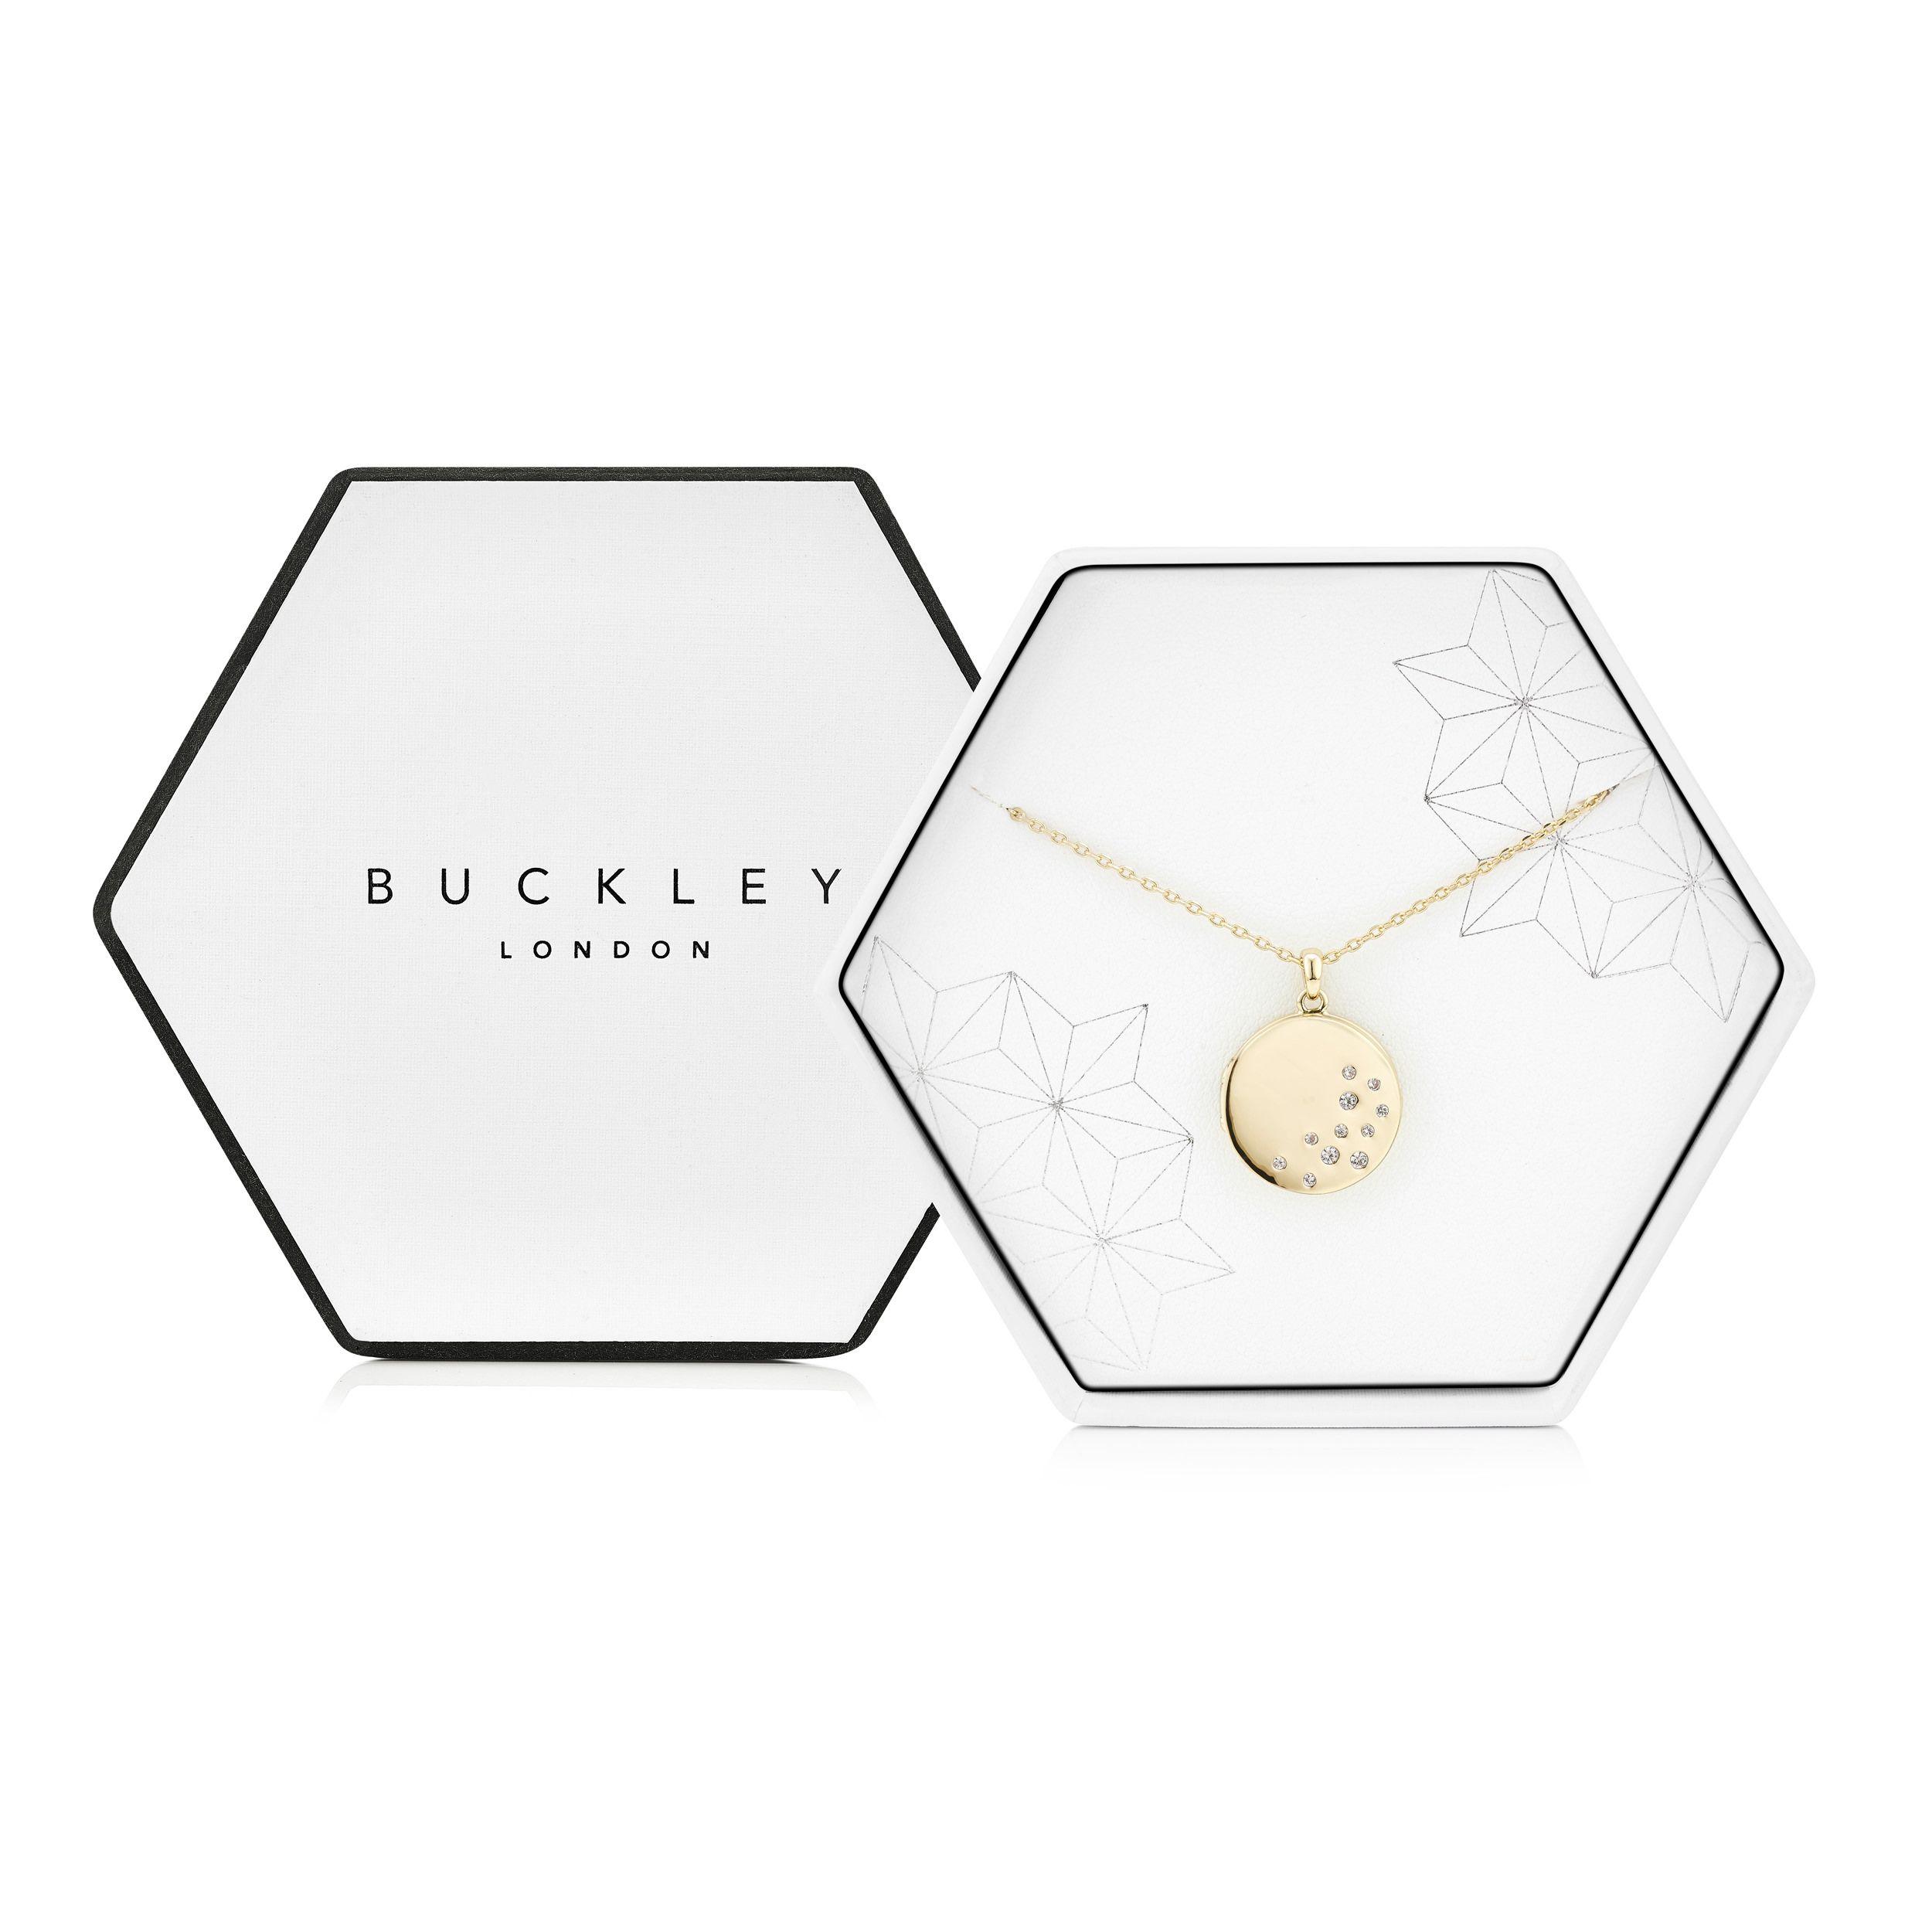 Buckley London Locket Pendant Box